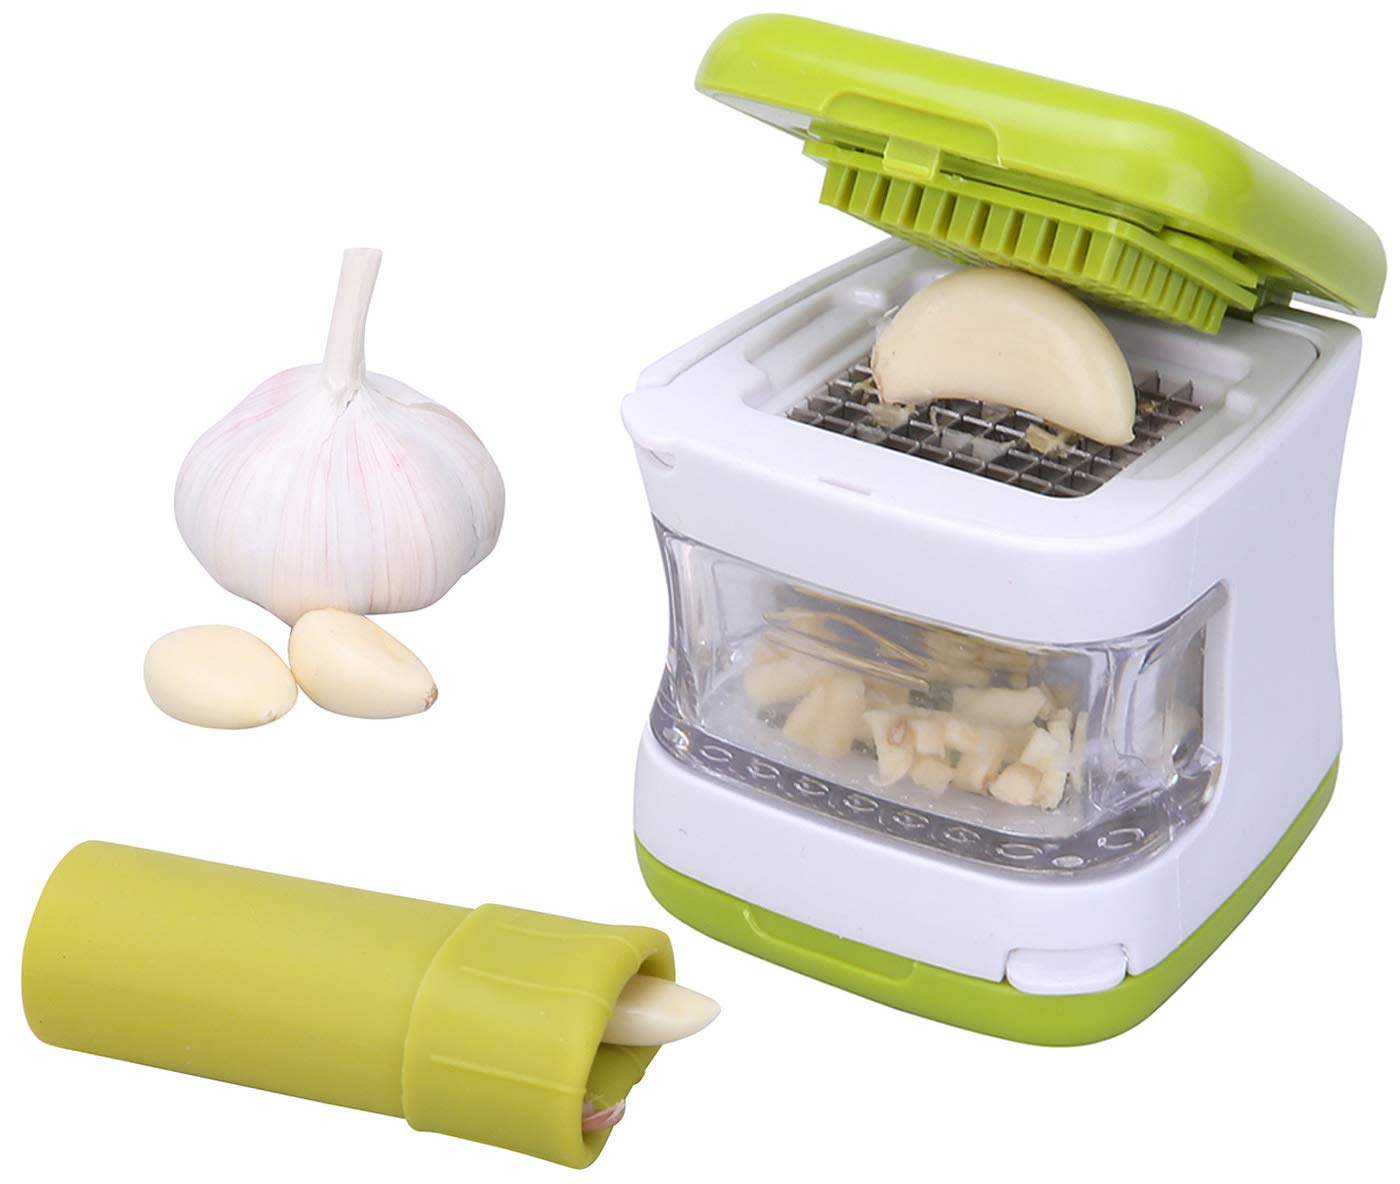 Garlic Peeler and Garlic Press Set, Silicone Garlic Peeler with Stay-Clean Storage Case, Stainless Steel Garlic Presser, Easy to Clean, Green, Practical Kitchen Utensil.